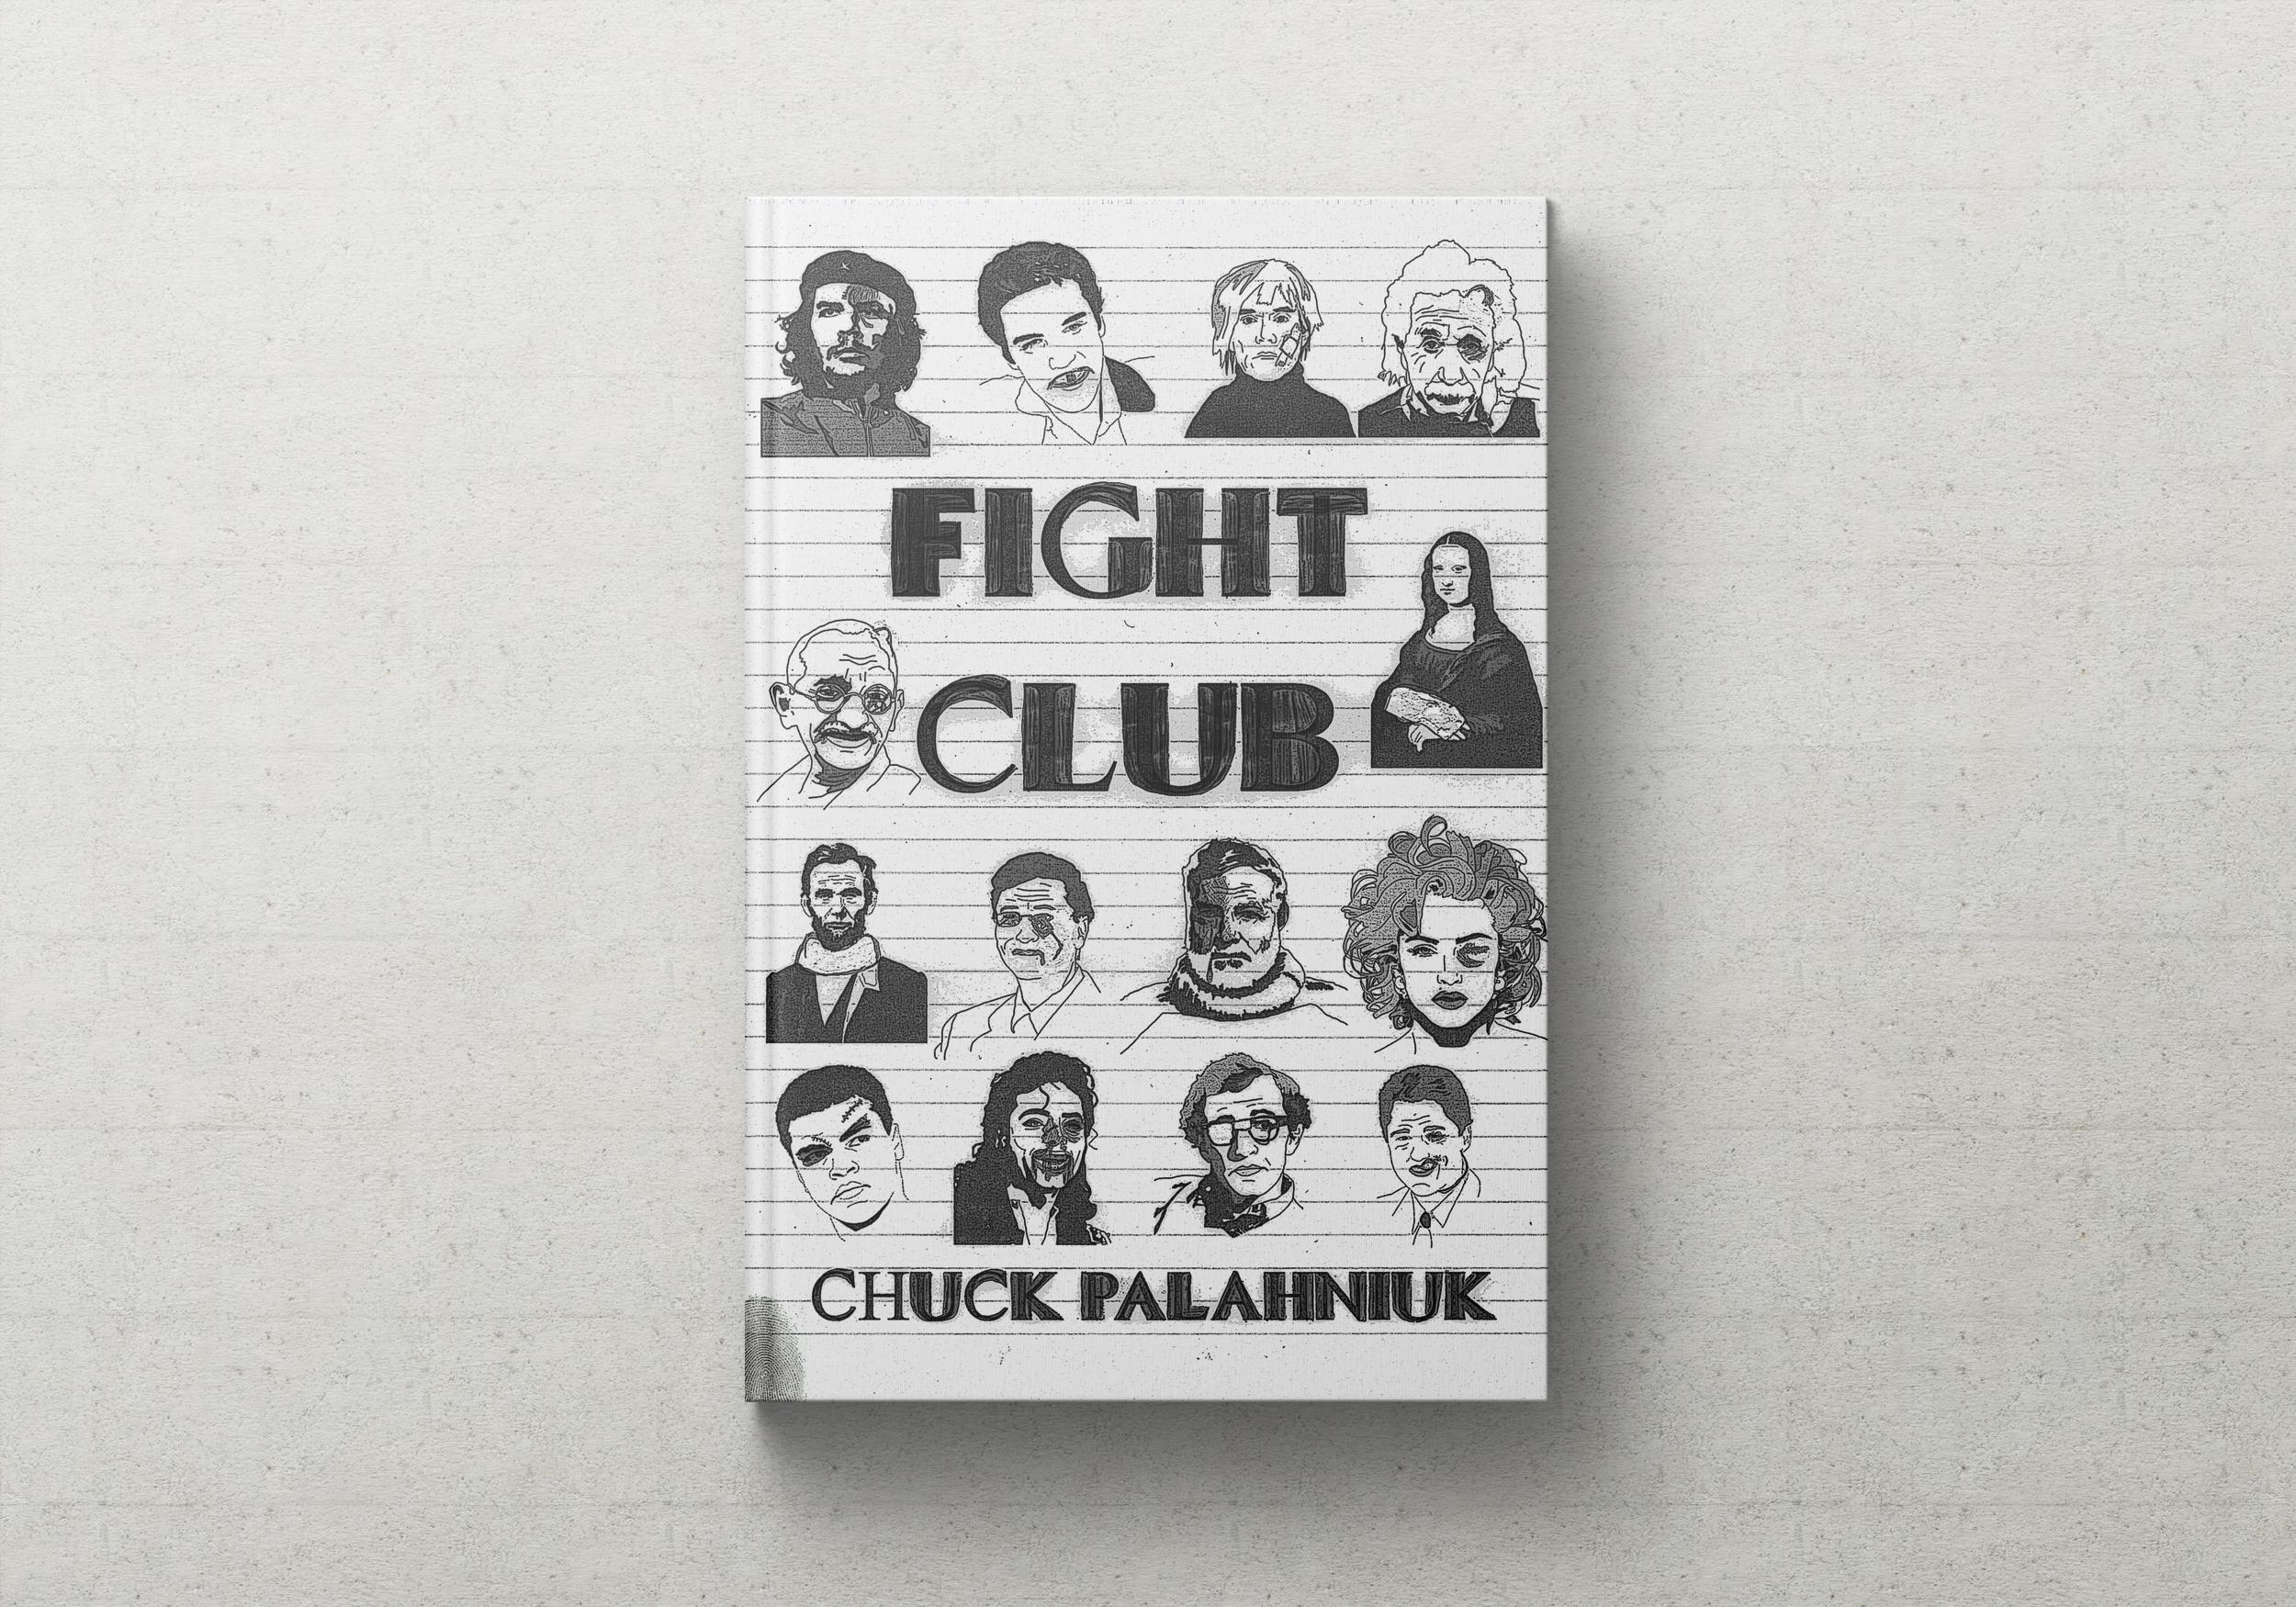 FIGHT CLUB Chuck Palahniuk